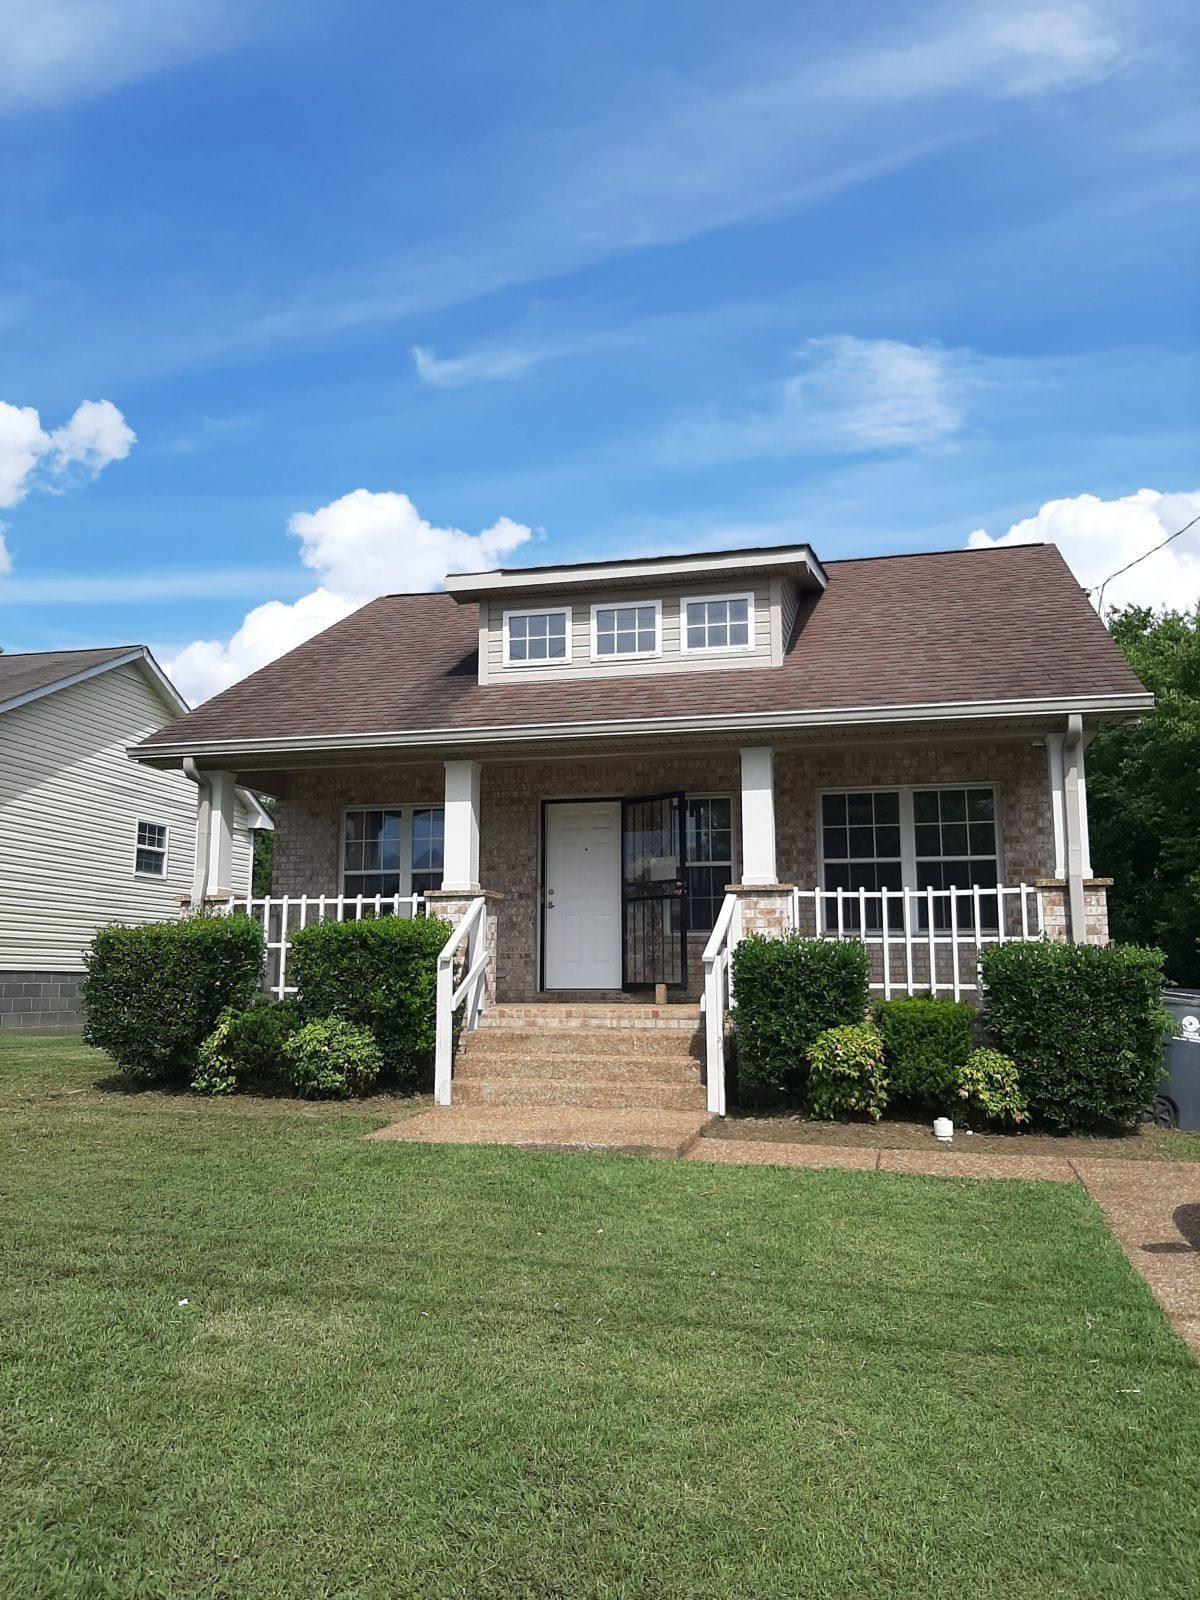 3328 Moorewood Dr #A, Nashville, TN 37207 - MLS#: 2174282